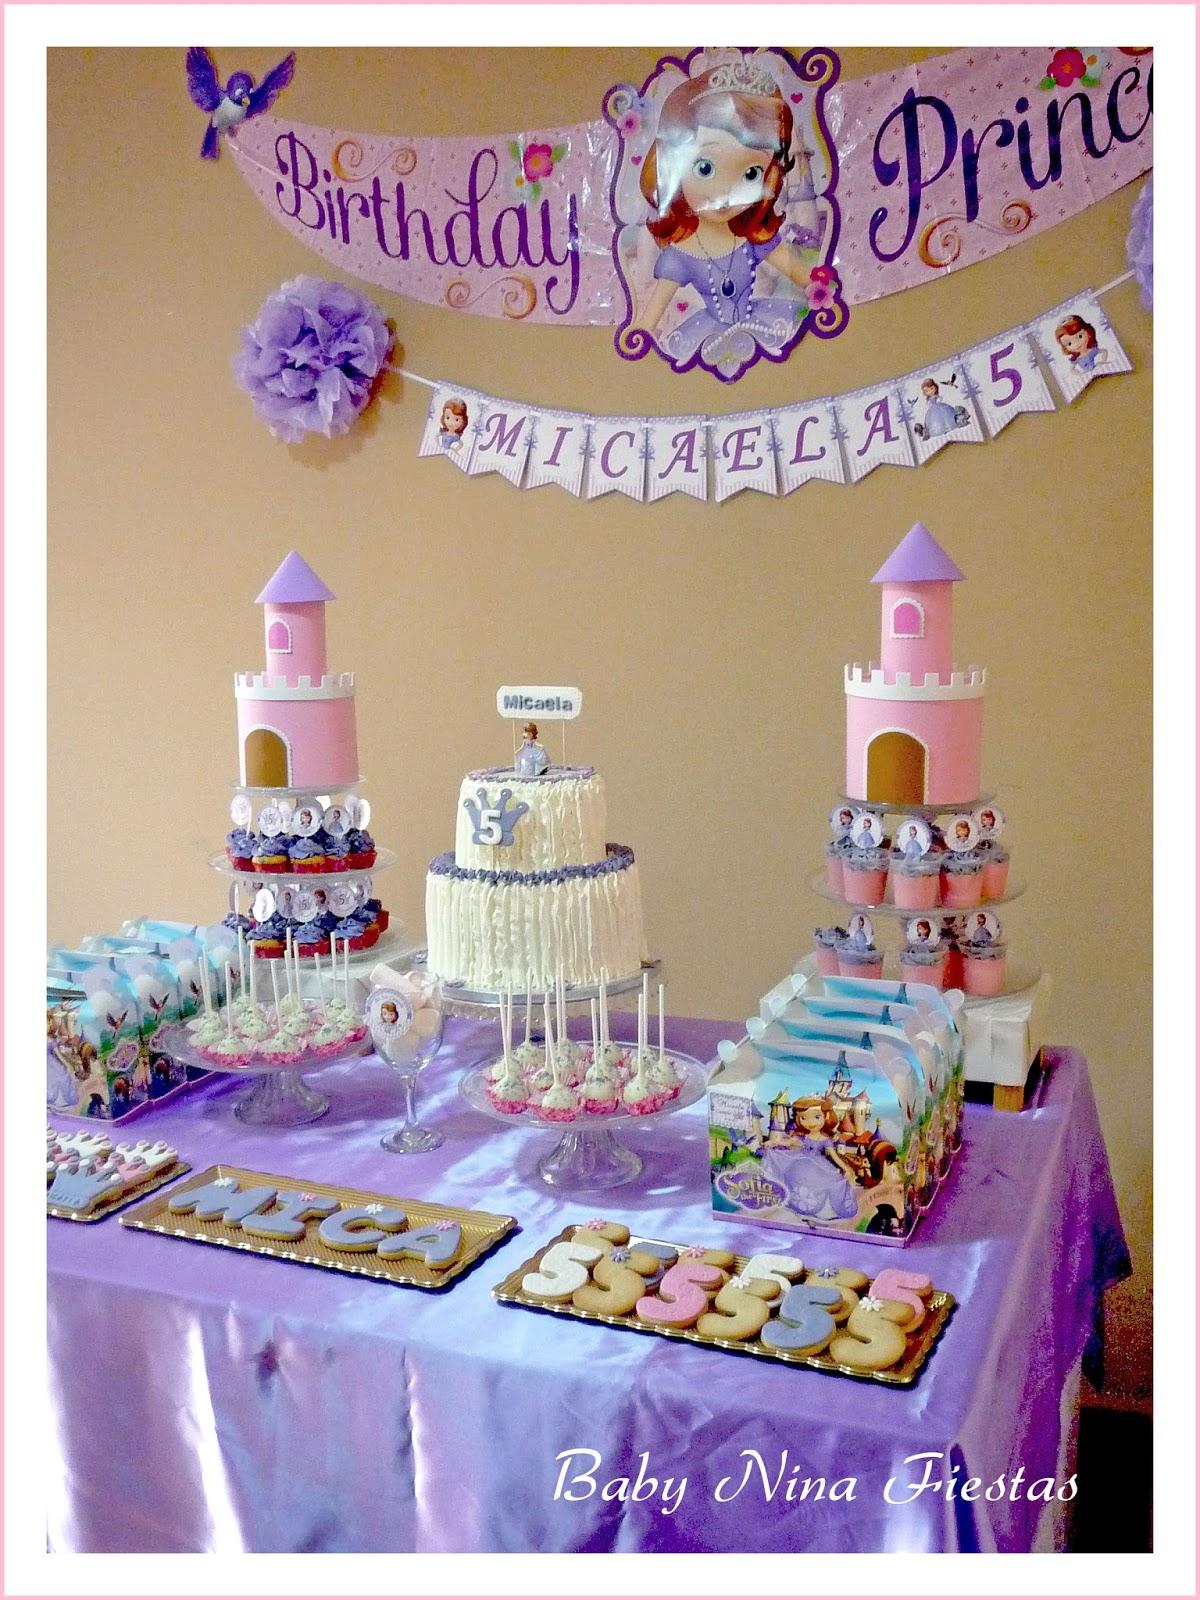 Baby nina fiestas mesa dulce tem tica princesa sof a para el 5to cumple de micaela - Ideas para decorar mesas de chuches ...